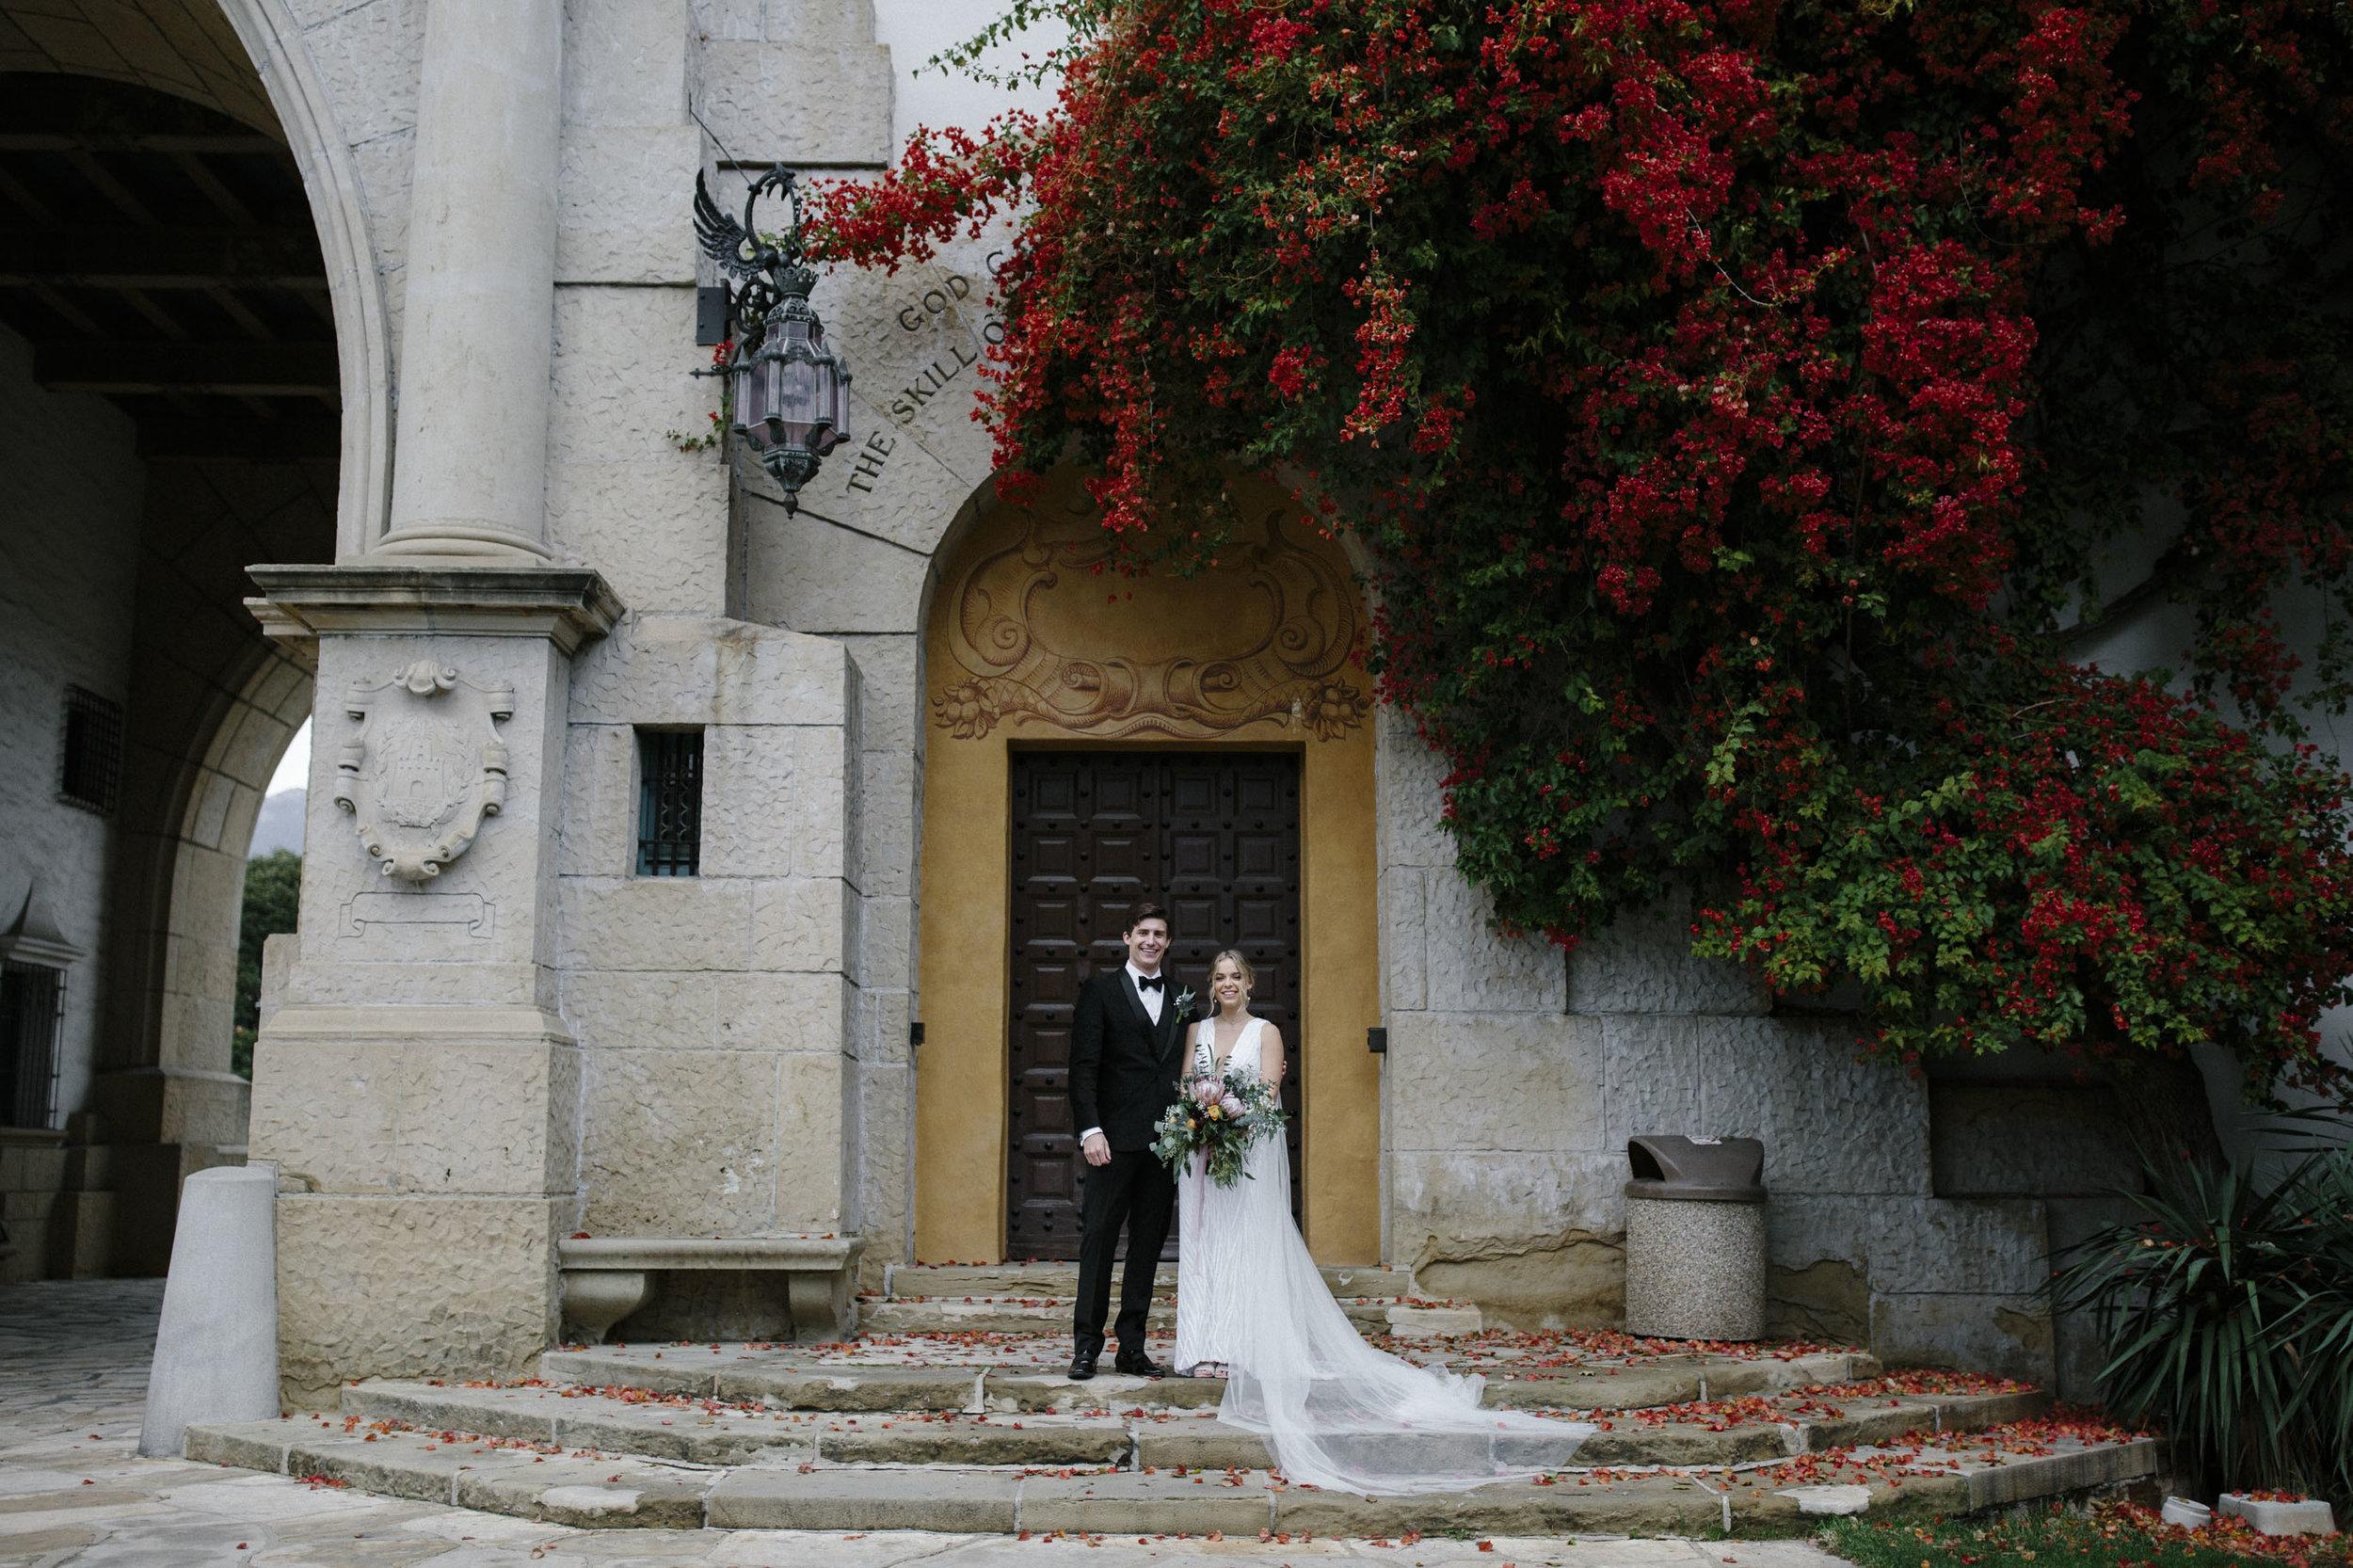 Reilly & Chris Wedding-59.jpg